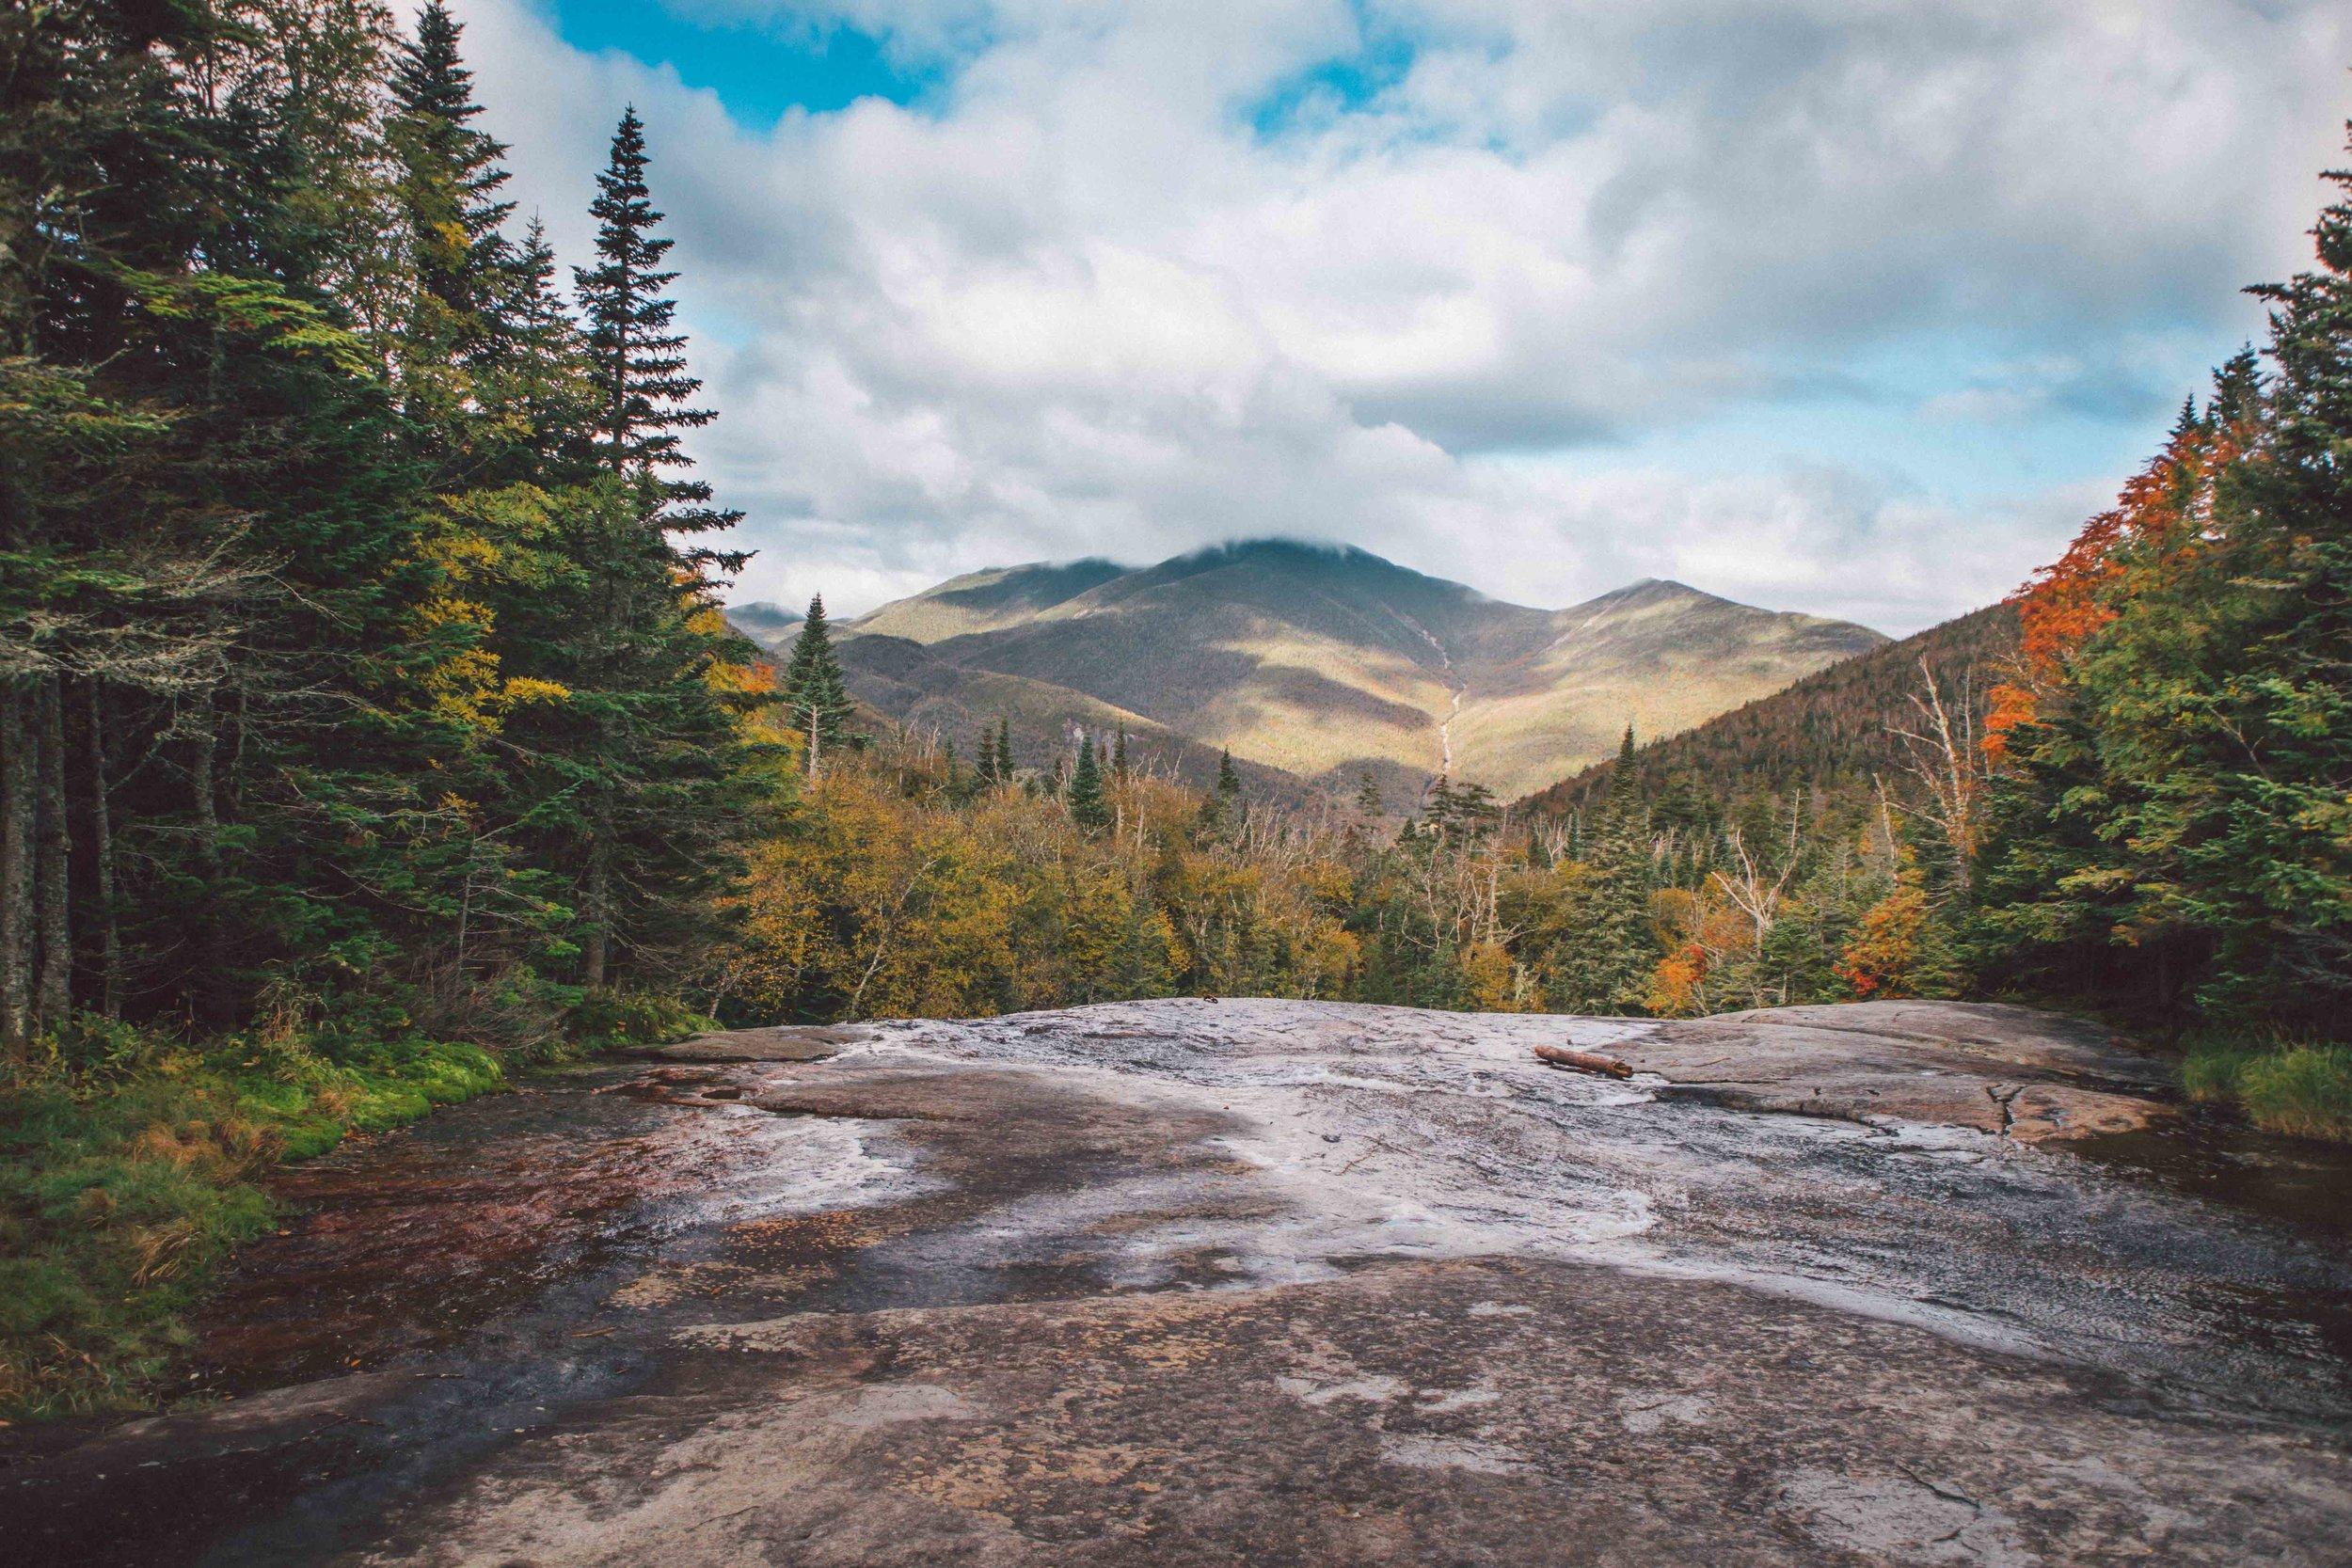 Adirondacks-2018-web-78-Mount-Marcy.jpg